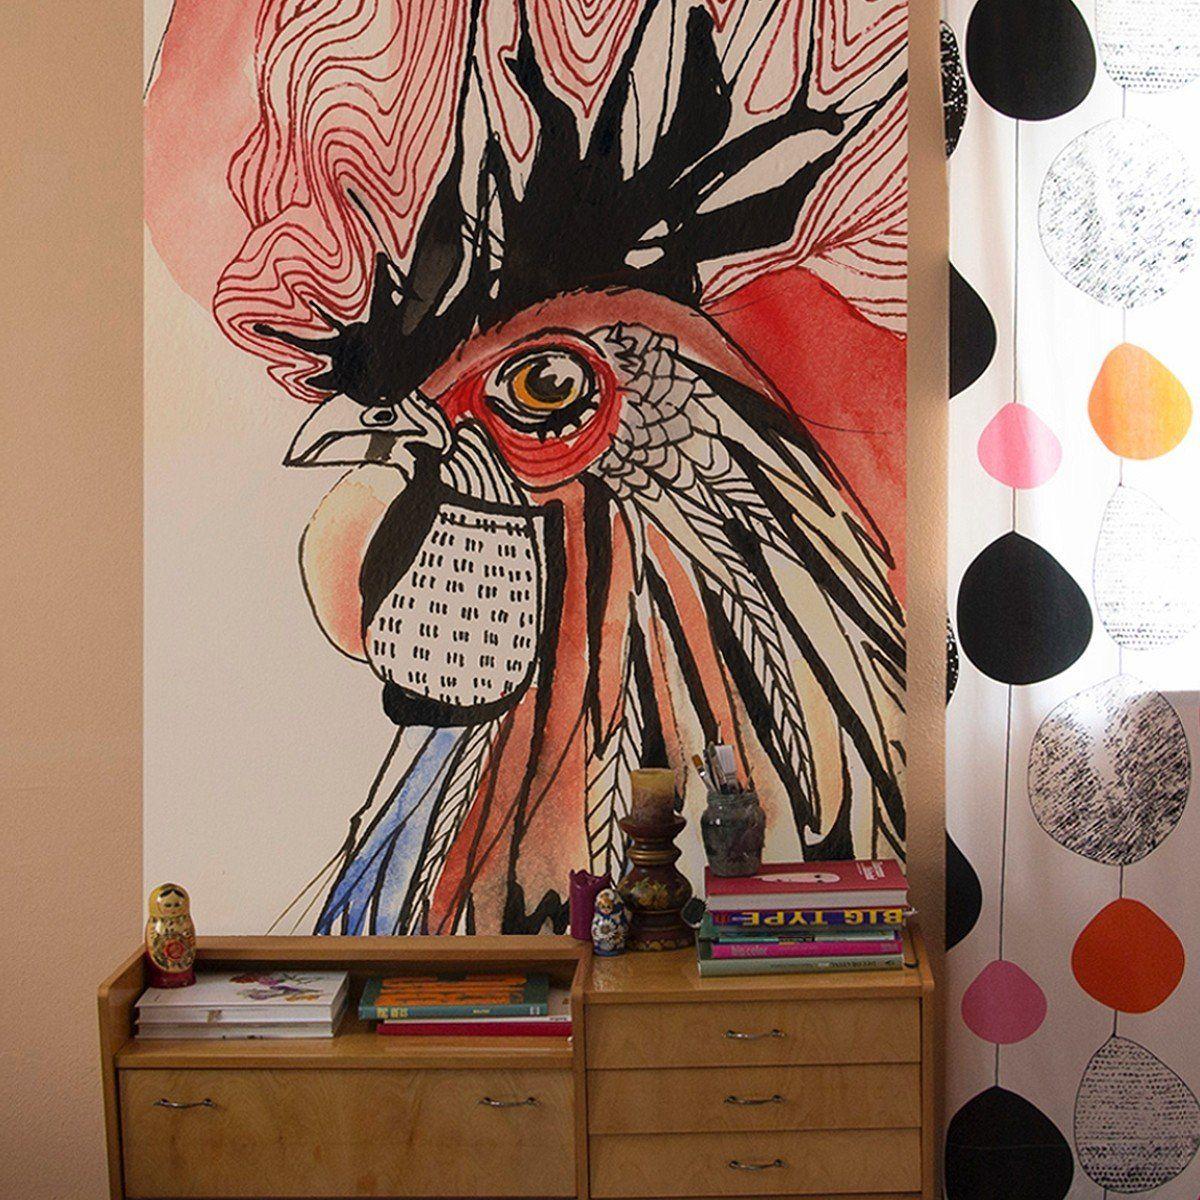 Wandtapetenaufkleber cock in   maria  pinterest  tapeten wände und fototapete